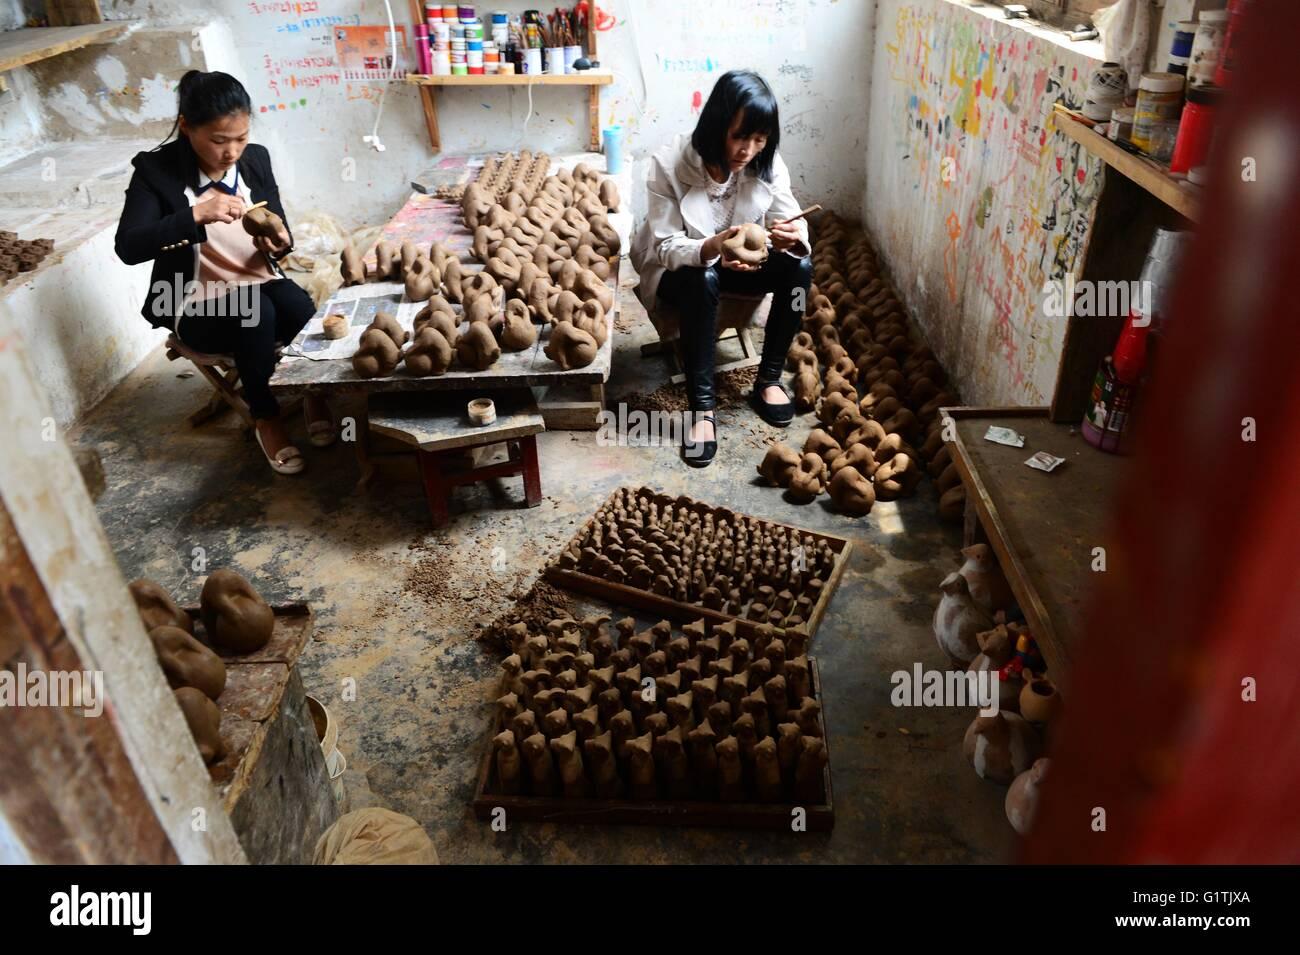 (160519) -- ZHENGZHOU, May 19, 2016 (Xinhua) -- Craftswomen work on clay sculptures at a workshop in Yangqitun Village - Stock Image